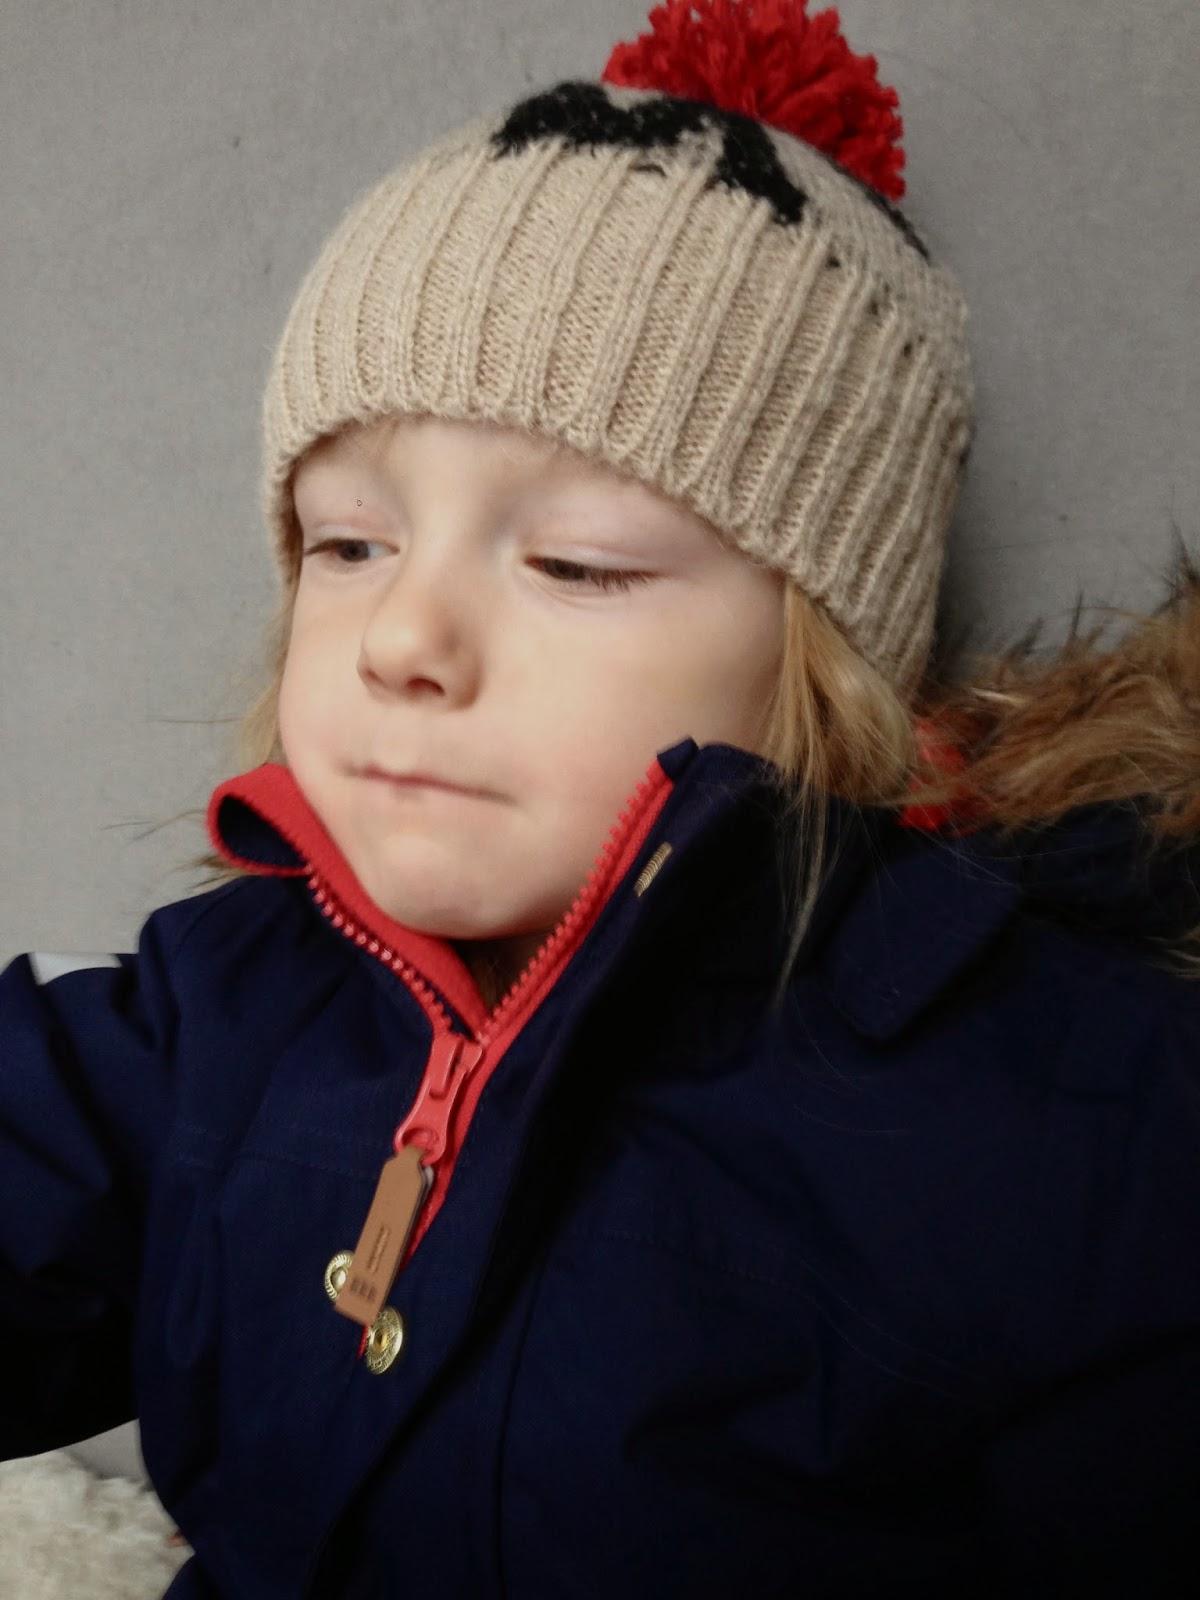 Bobo Choses, knit hat, mohair, 6-7 years, 6-7 år, small sizing, liten storlek, ylle mössa, tofs mössa, Mini Rodini overall, expedition alaska